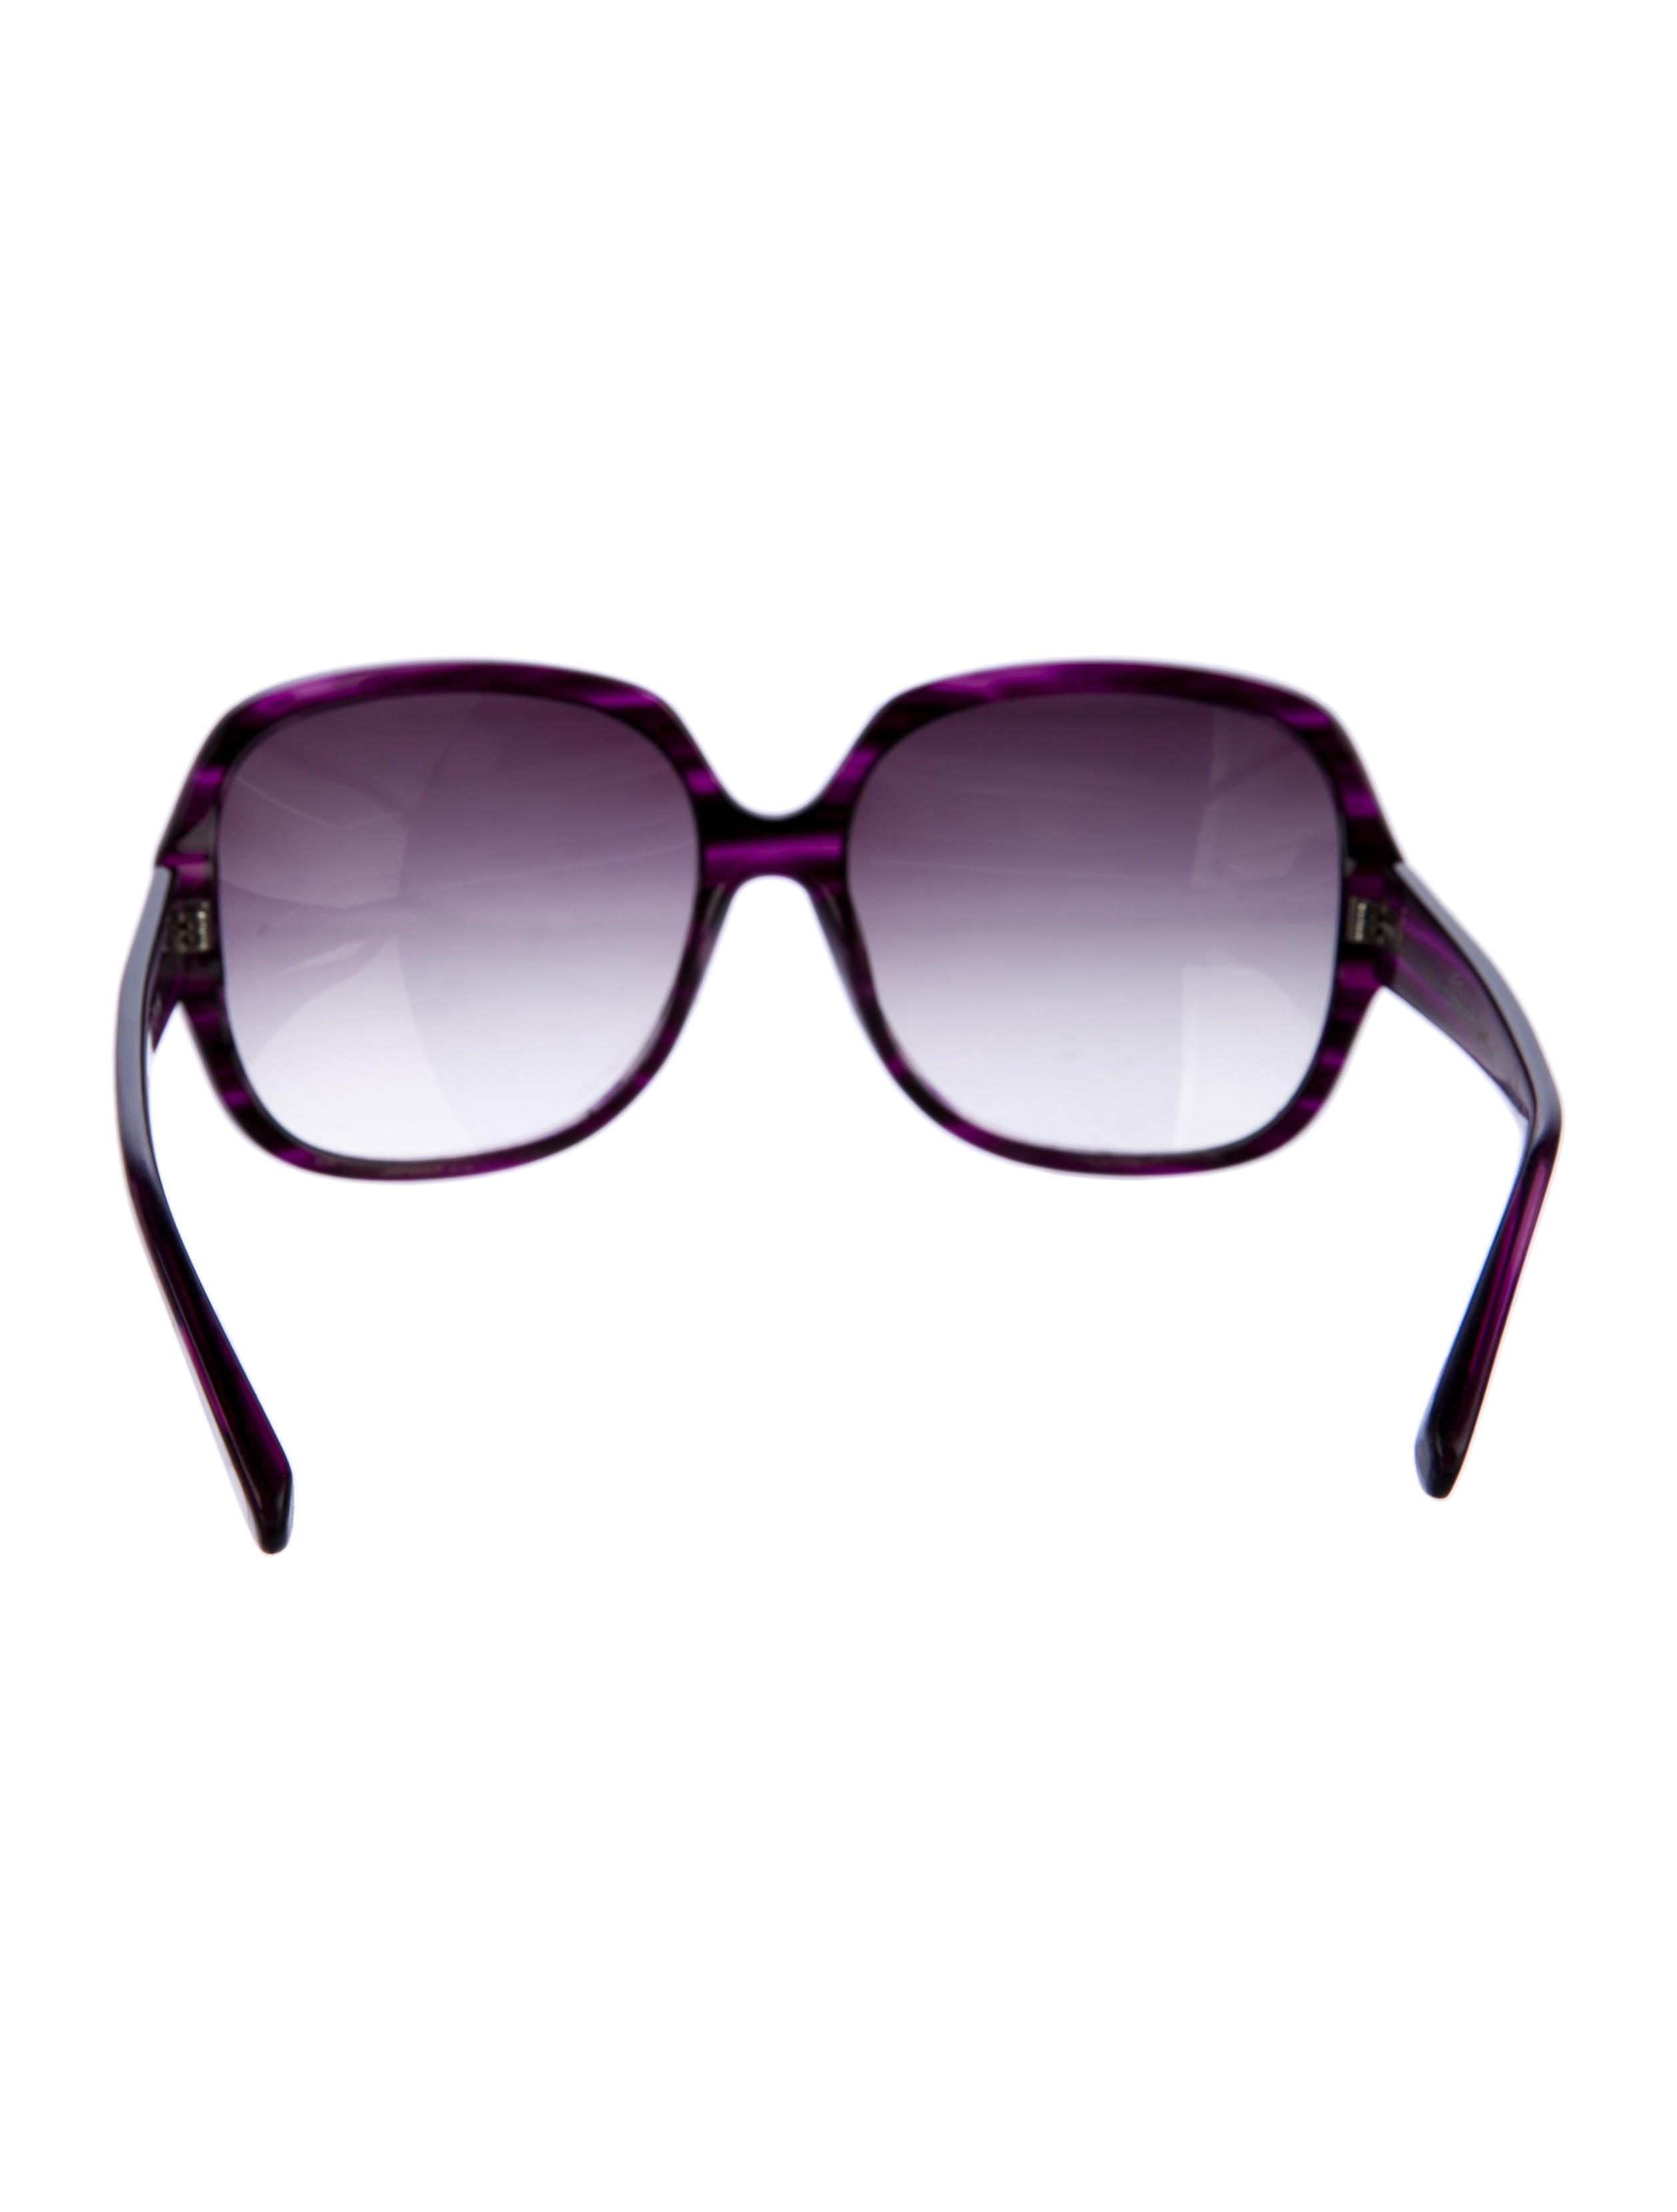 b4a5795b6117 Dita Supa-Dupa Oversize Sunglasses - Accessories - WDT20830